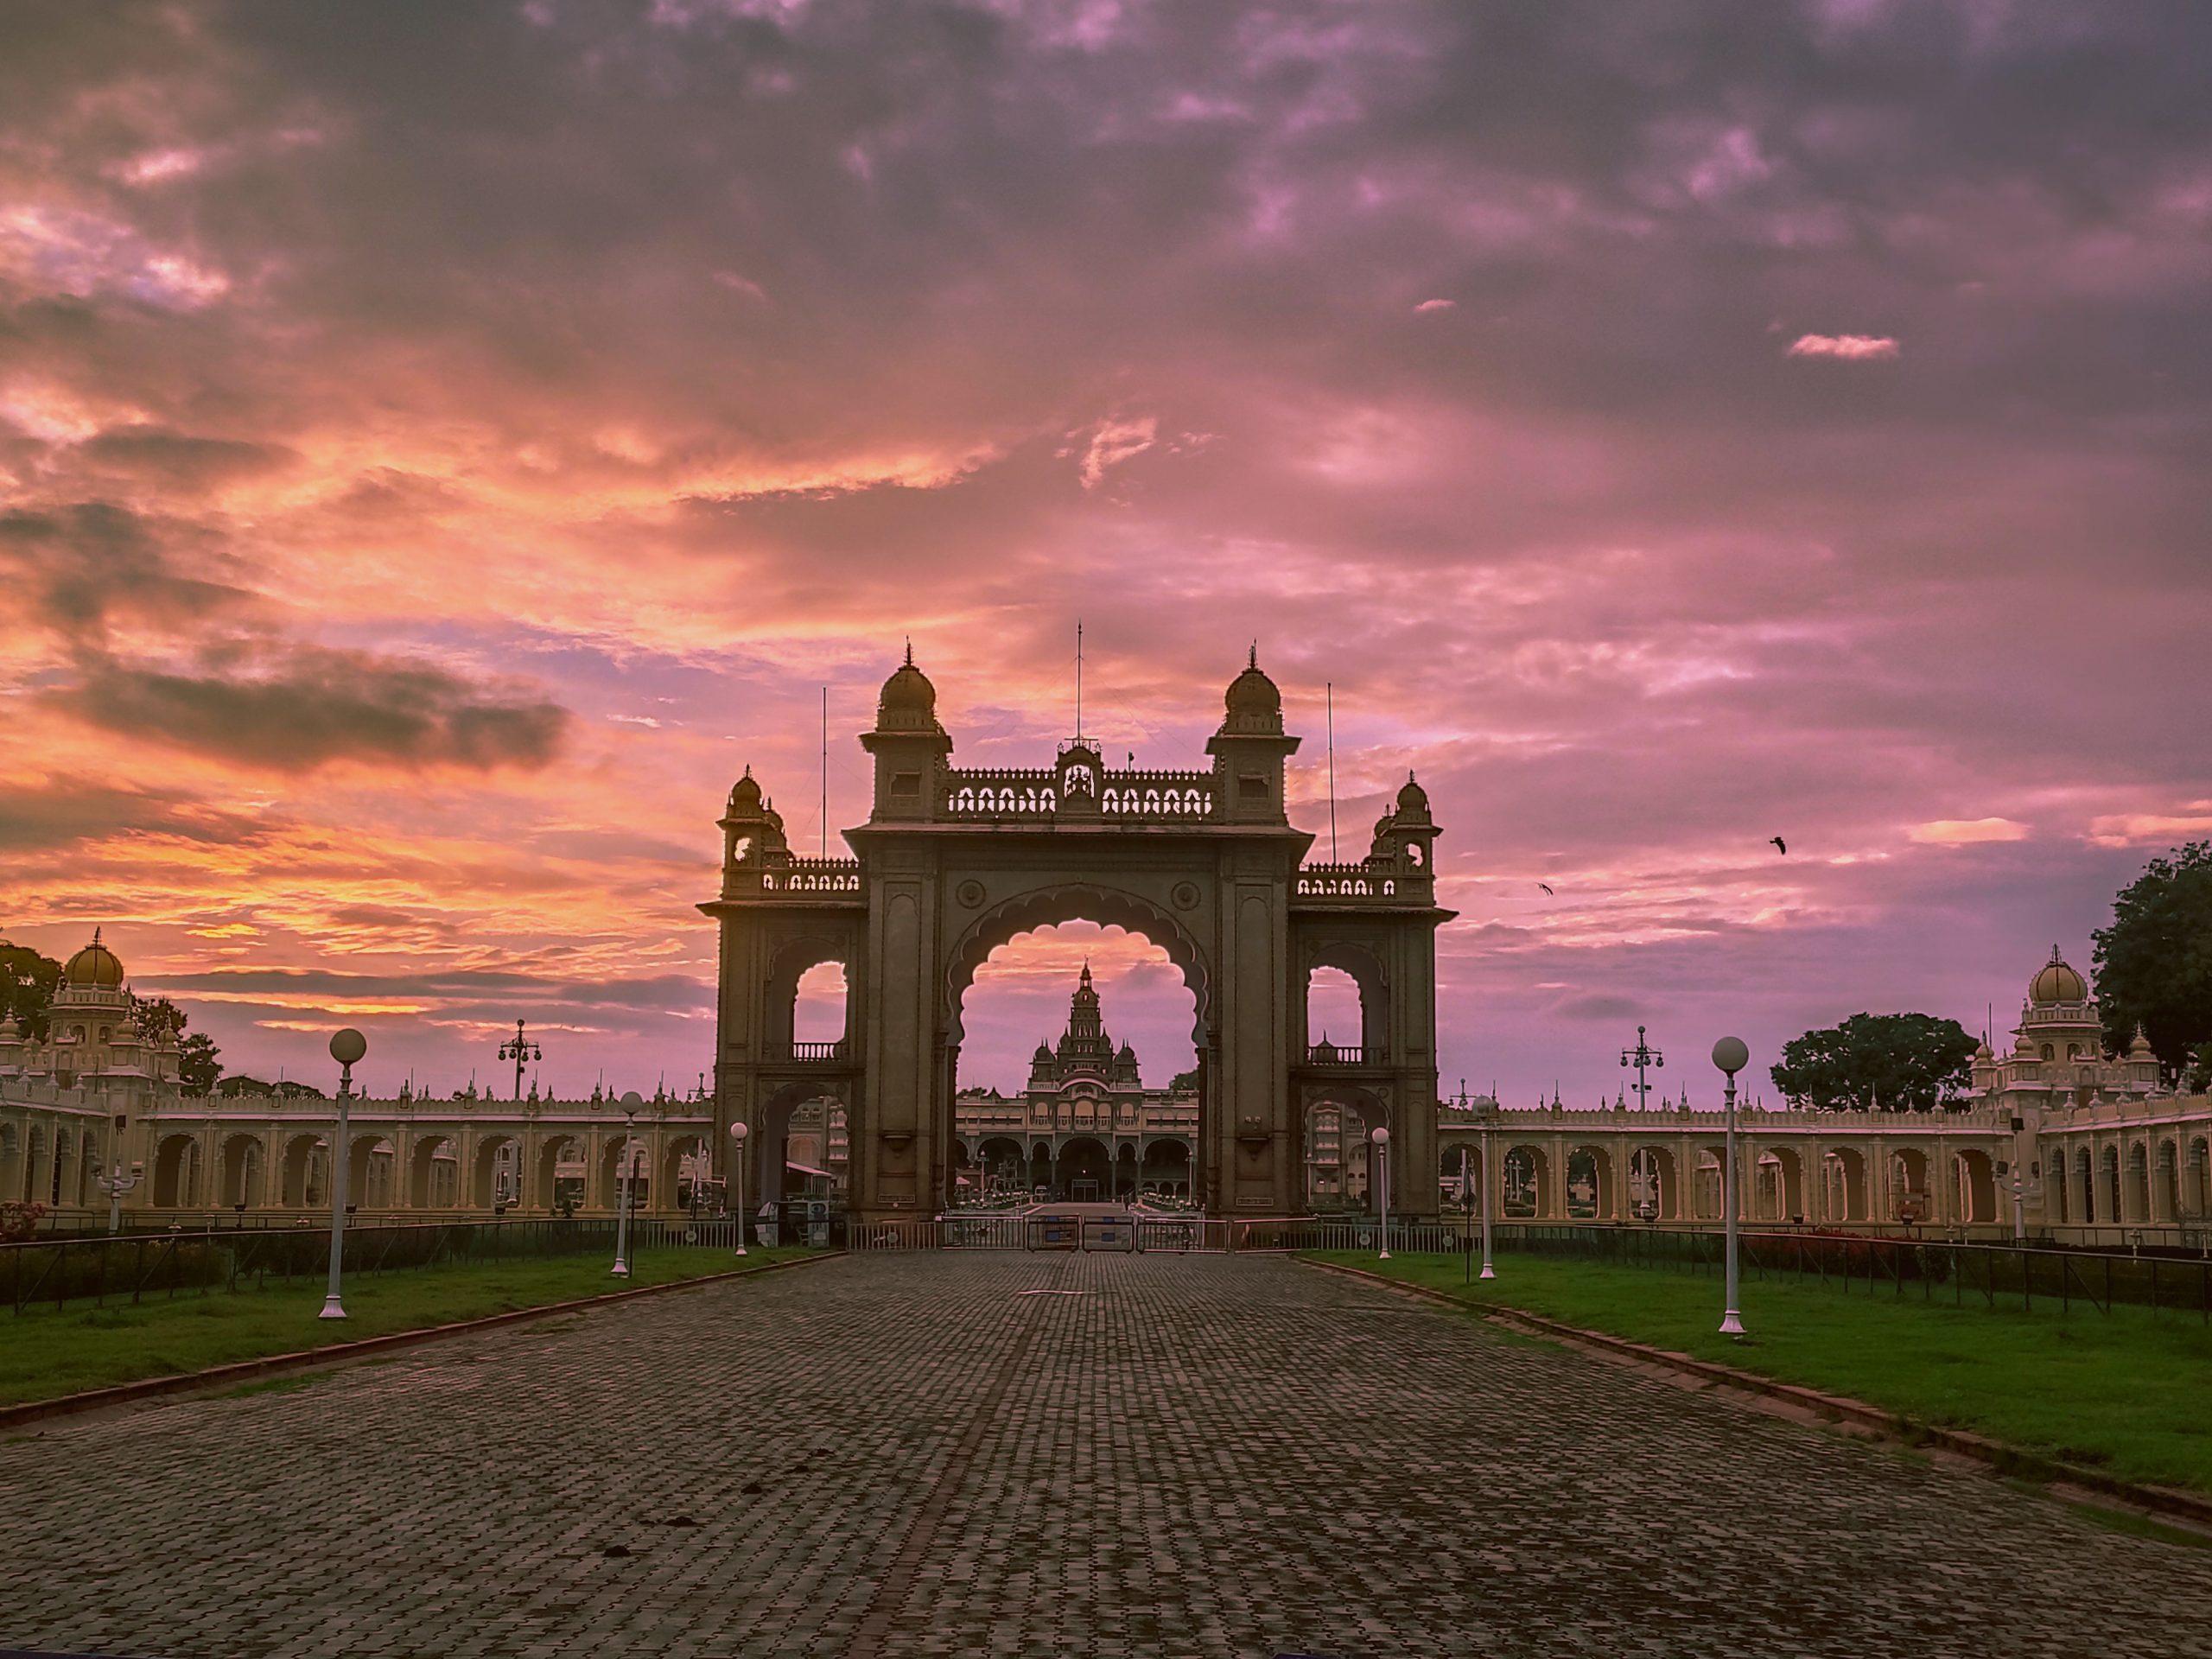 Indian Palace and Pink Sky